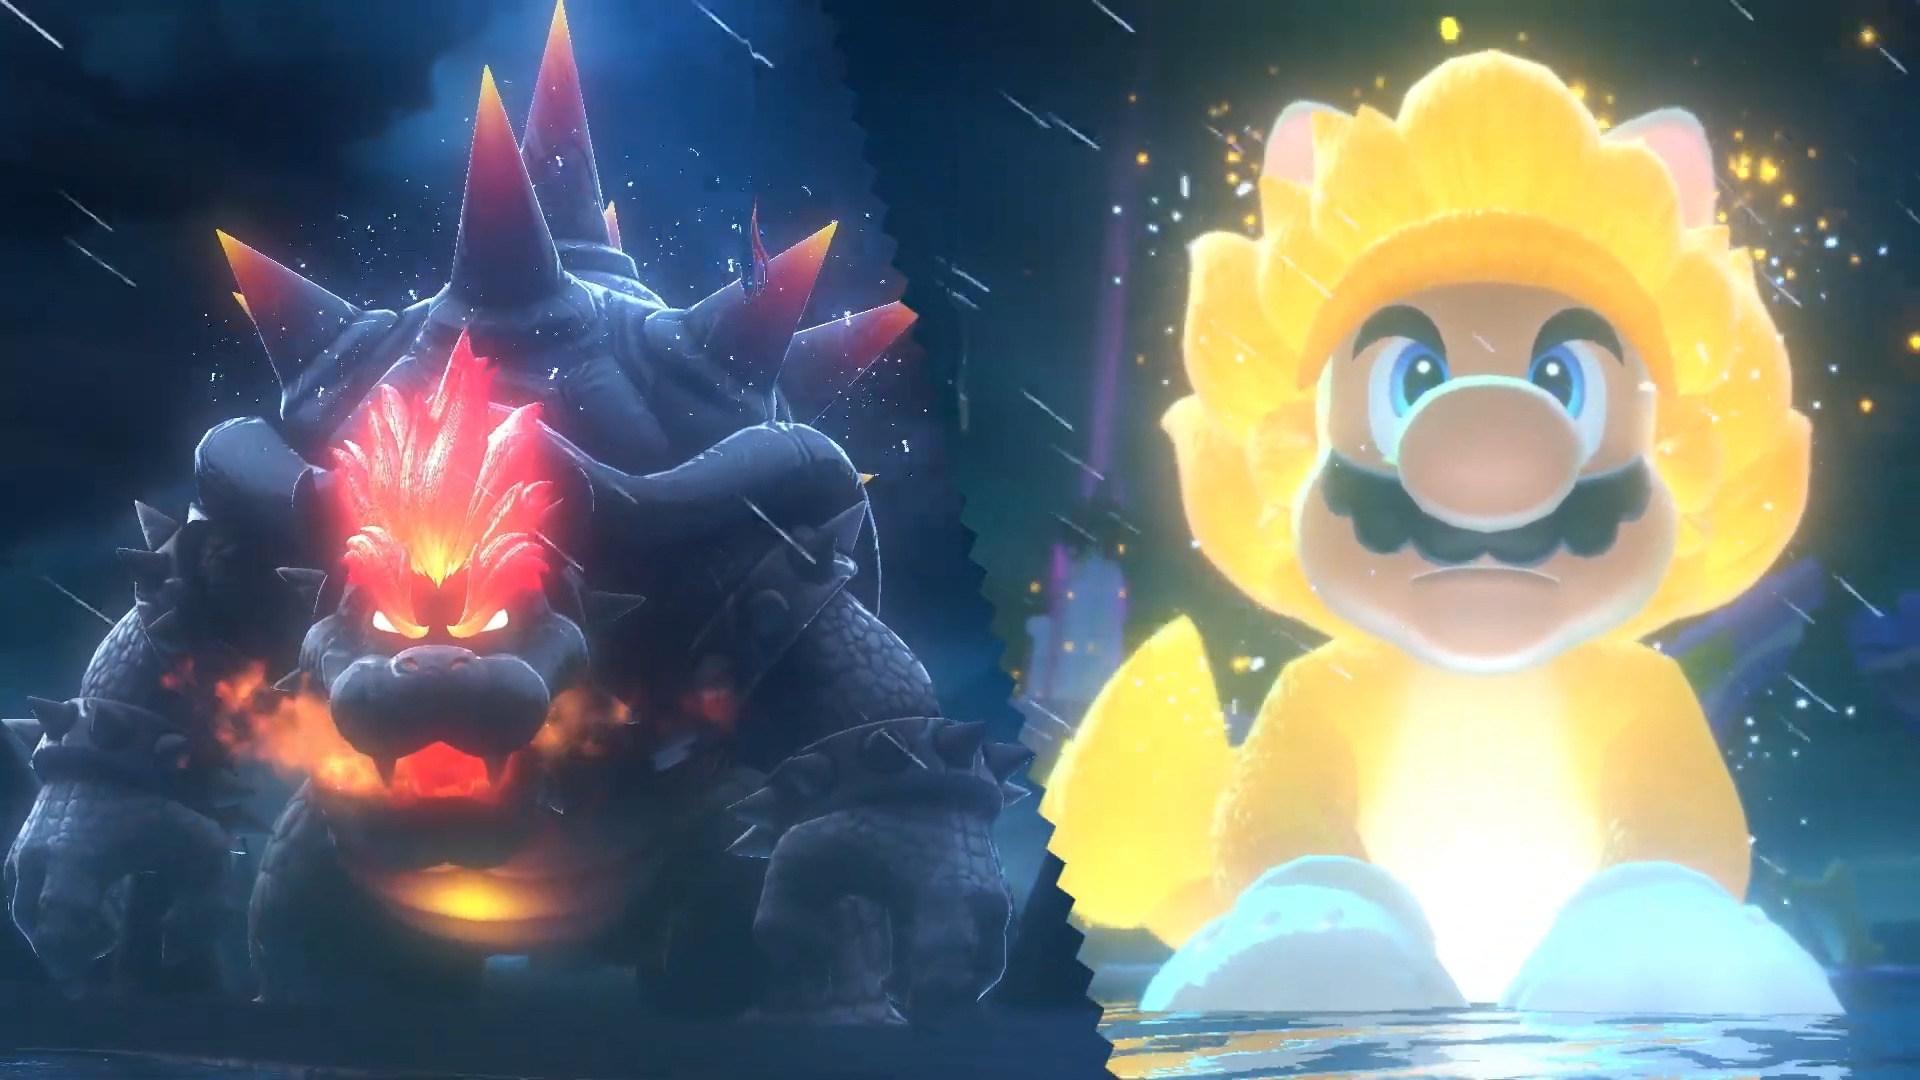 Trailer, Nintendo, Nintendo Switch, Switch, Super Mario, Jump & Run, Super Mario 3D World + Bowser's Fury, Super Mario 3D World, Bowser's Fury